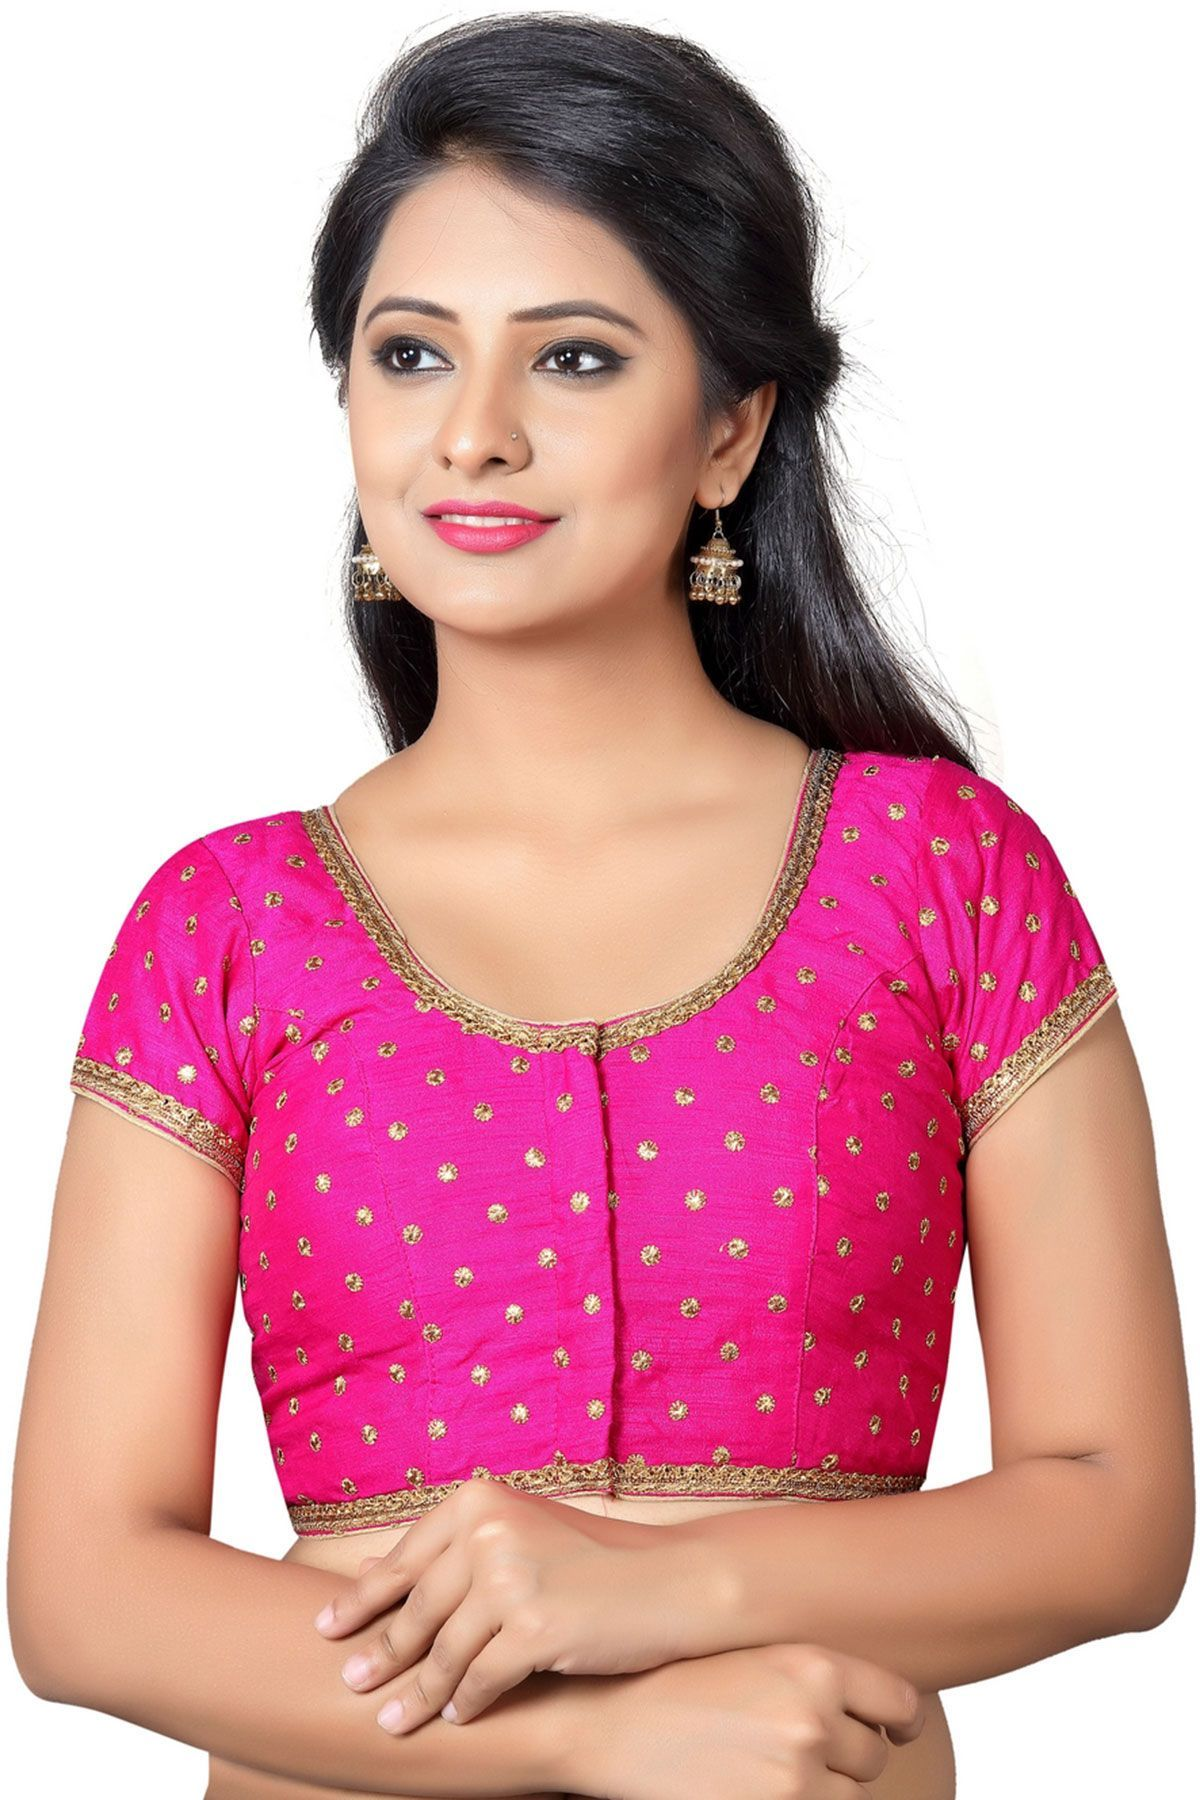 indian blouse resam design blouse light pink blouse readymade blouse saree blouse Banglori satin silk blouse fancy blouse